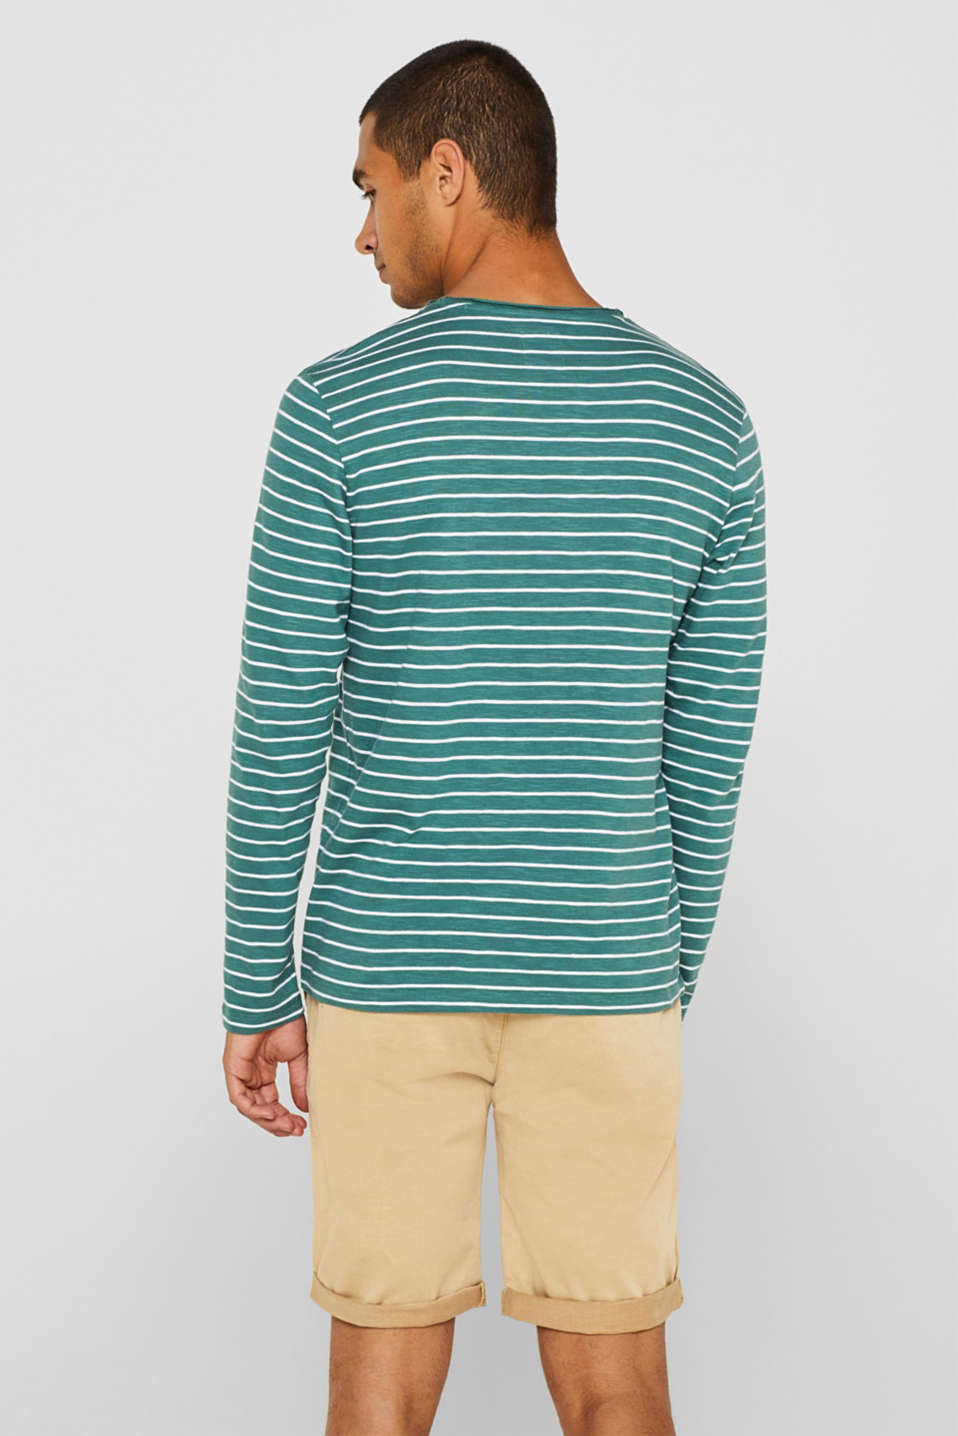 Jersey longsleeve top made of slub jersey, DUSTY GREEN, detail image number 3